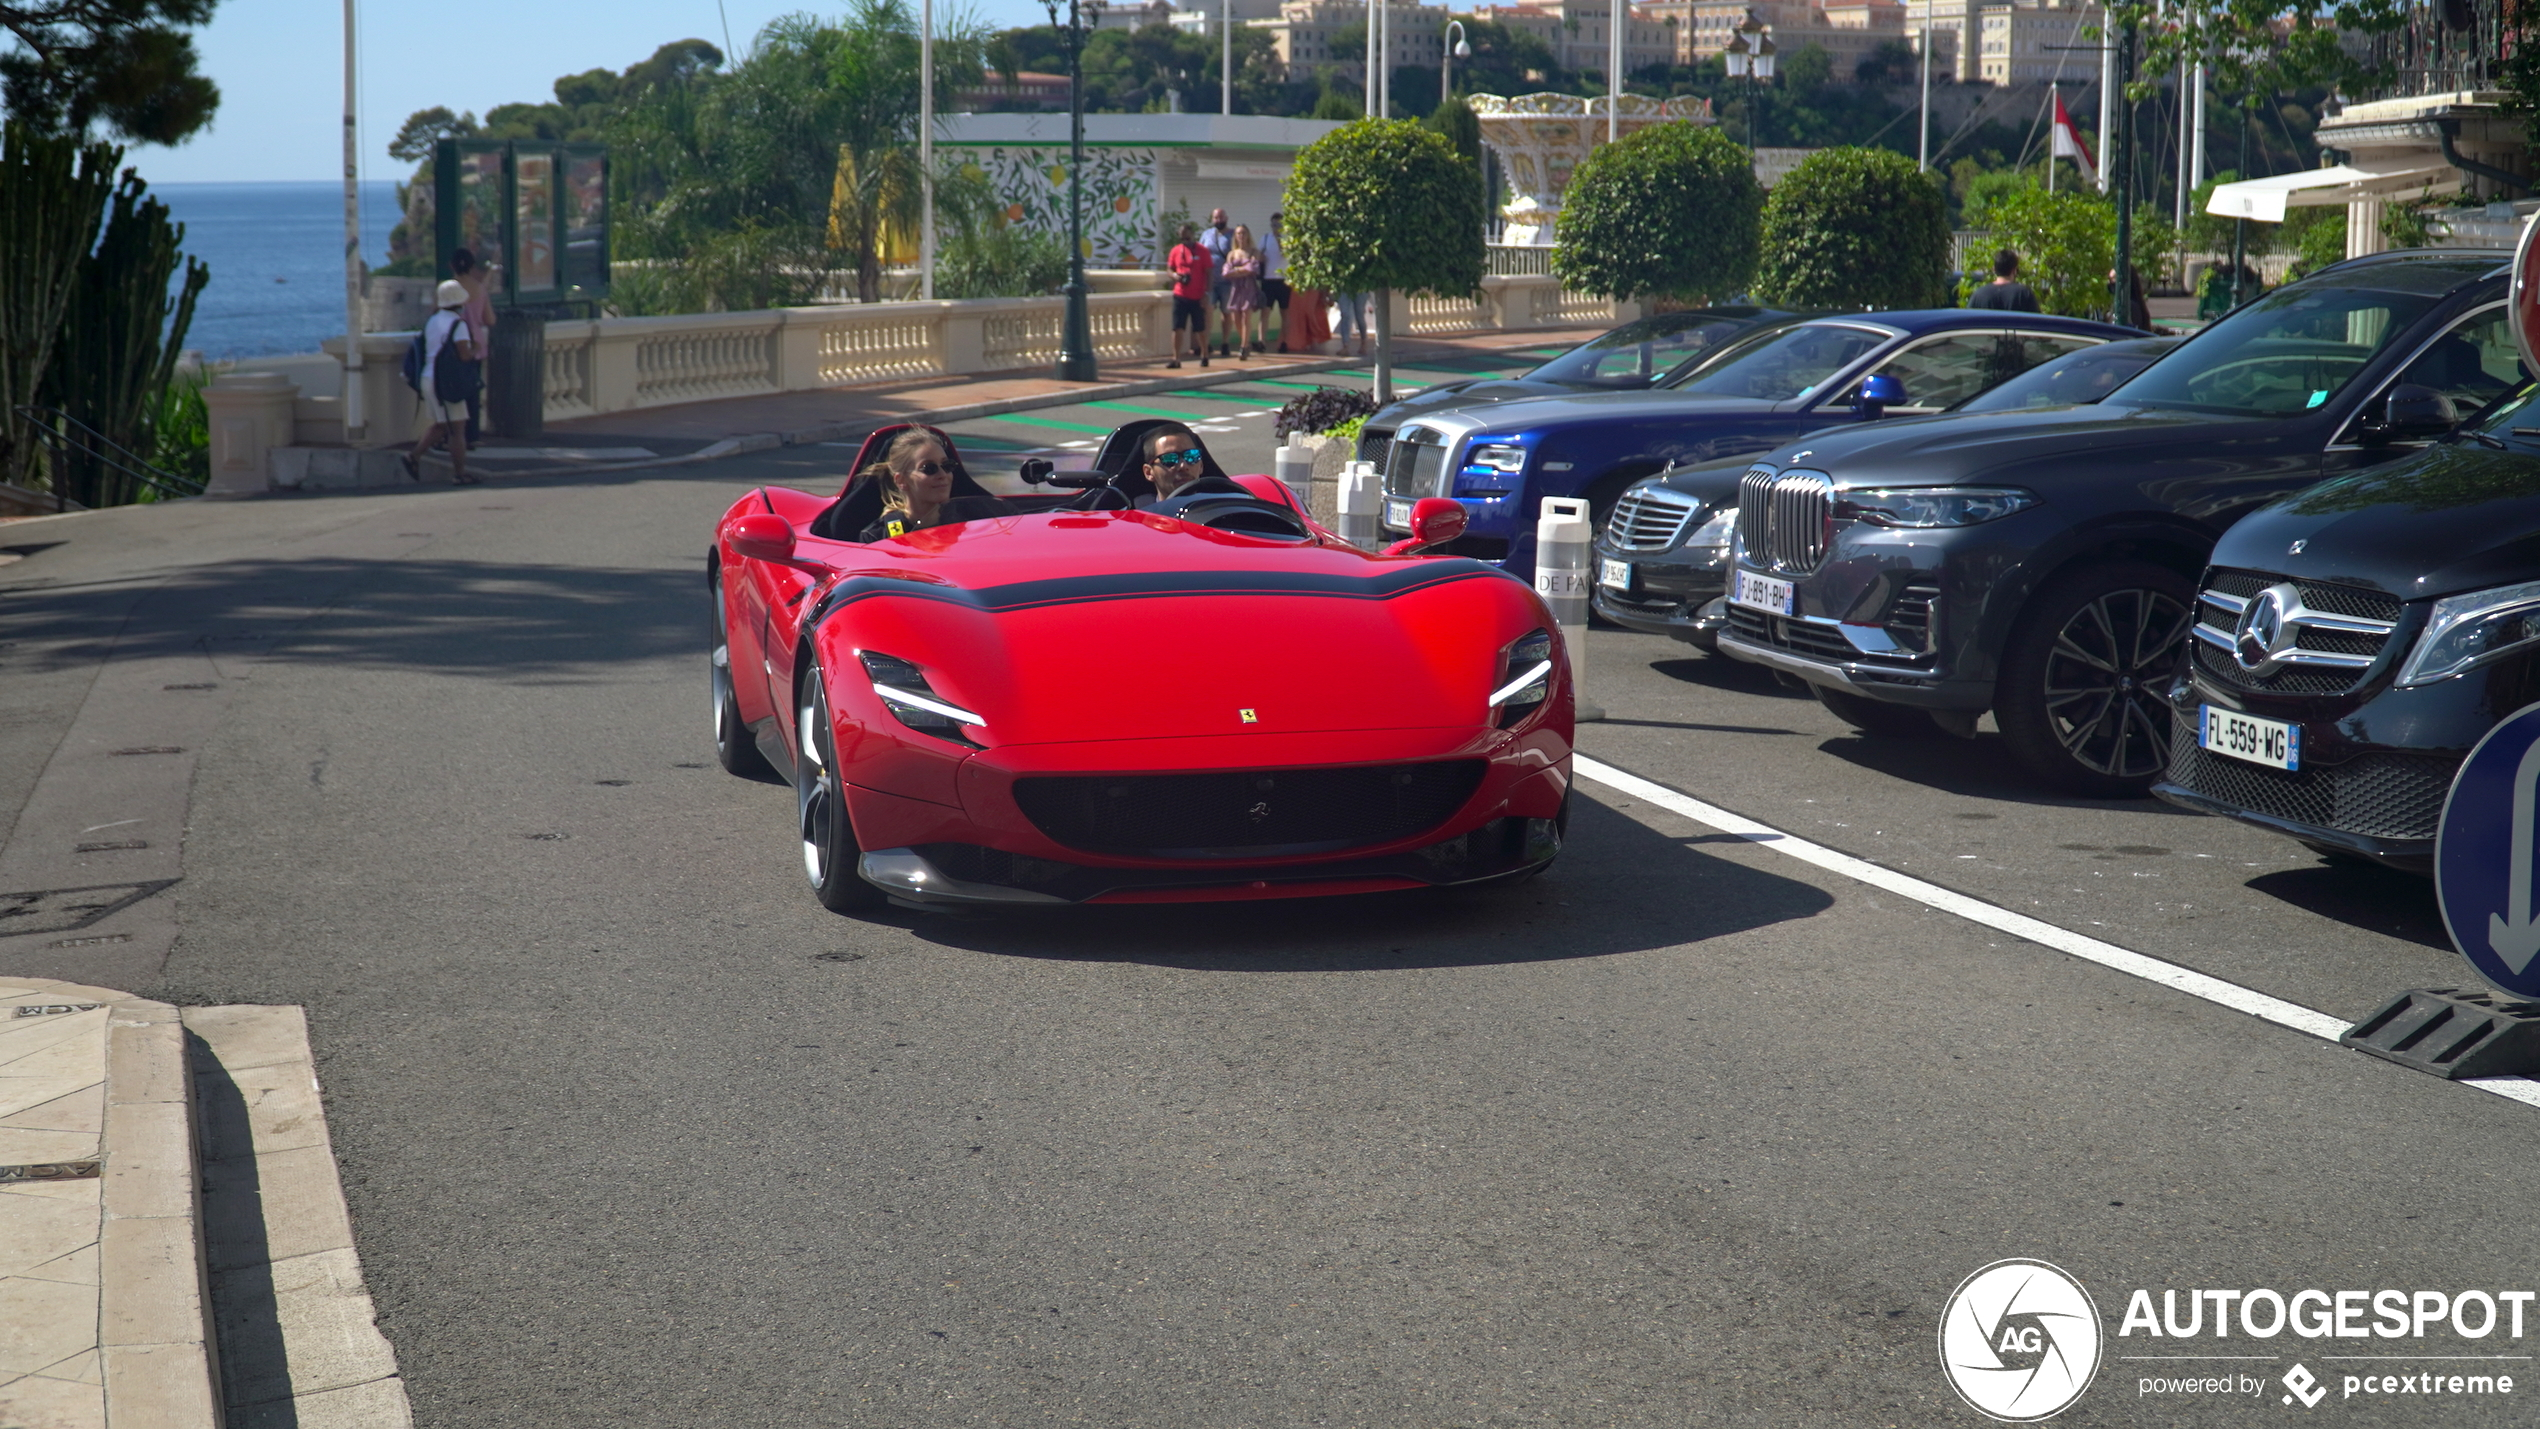 Monaco brengt ons de zevende(!) Ferrari Monza SP2 al